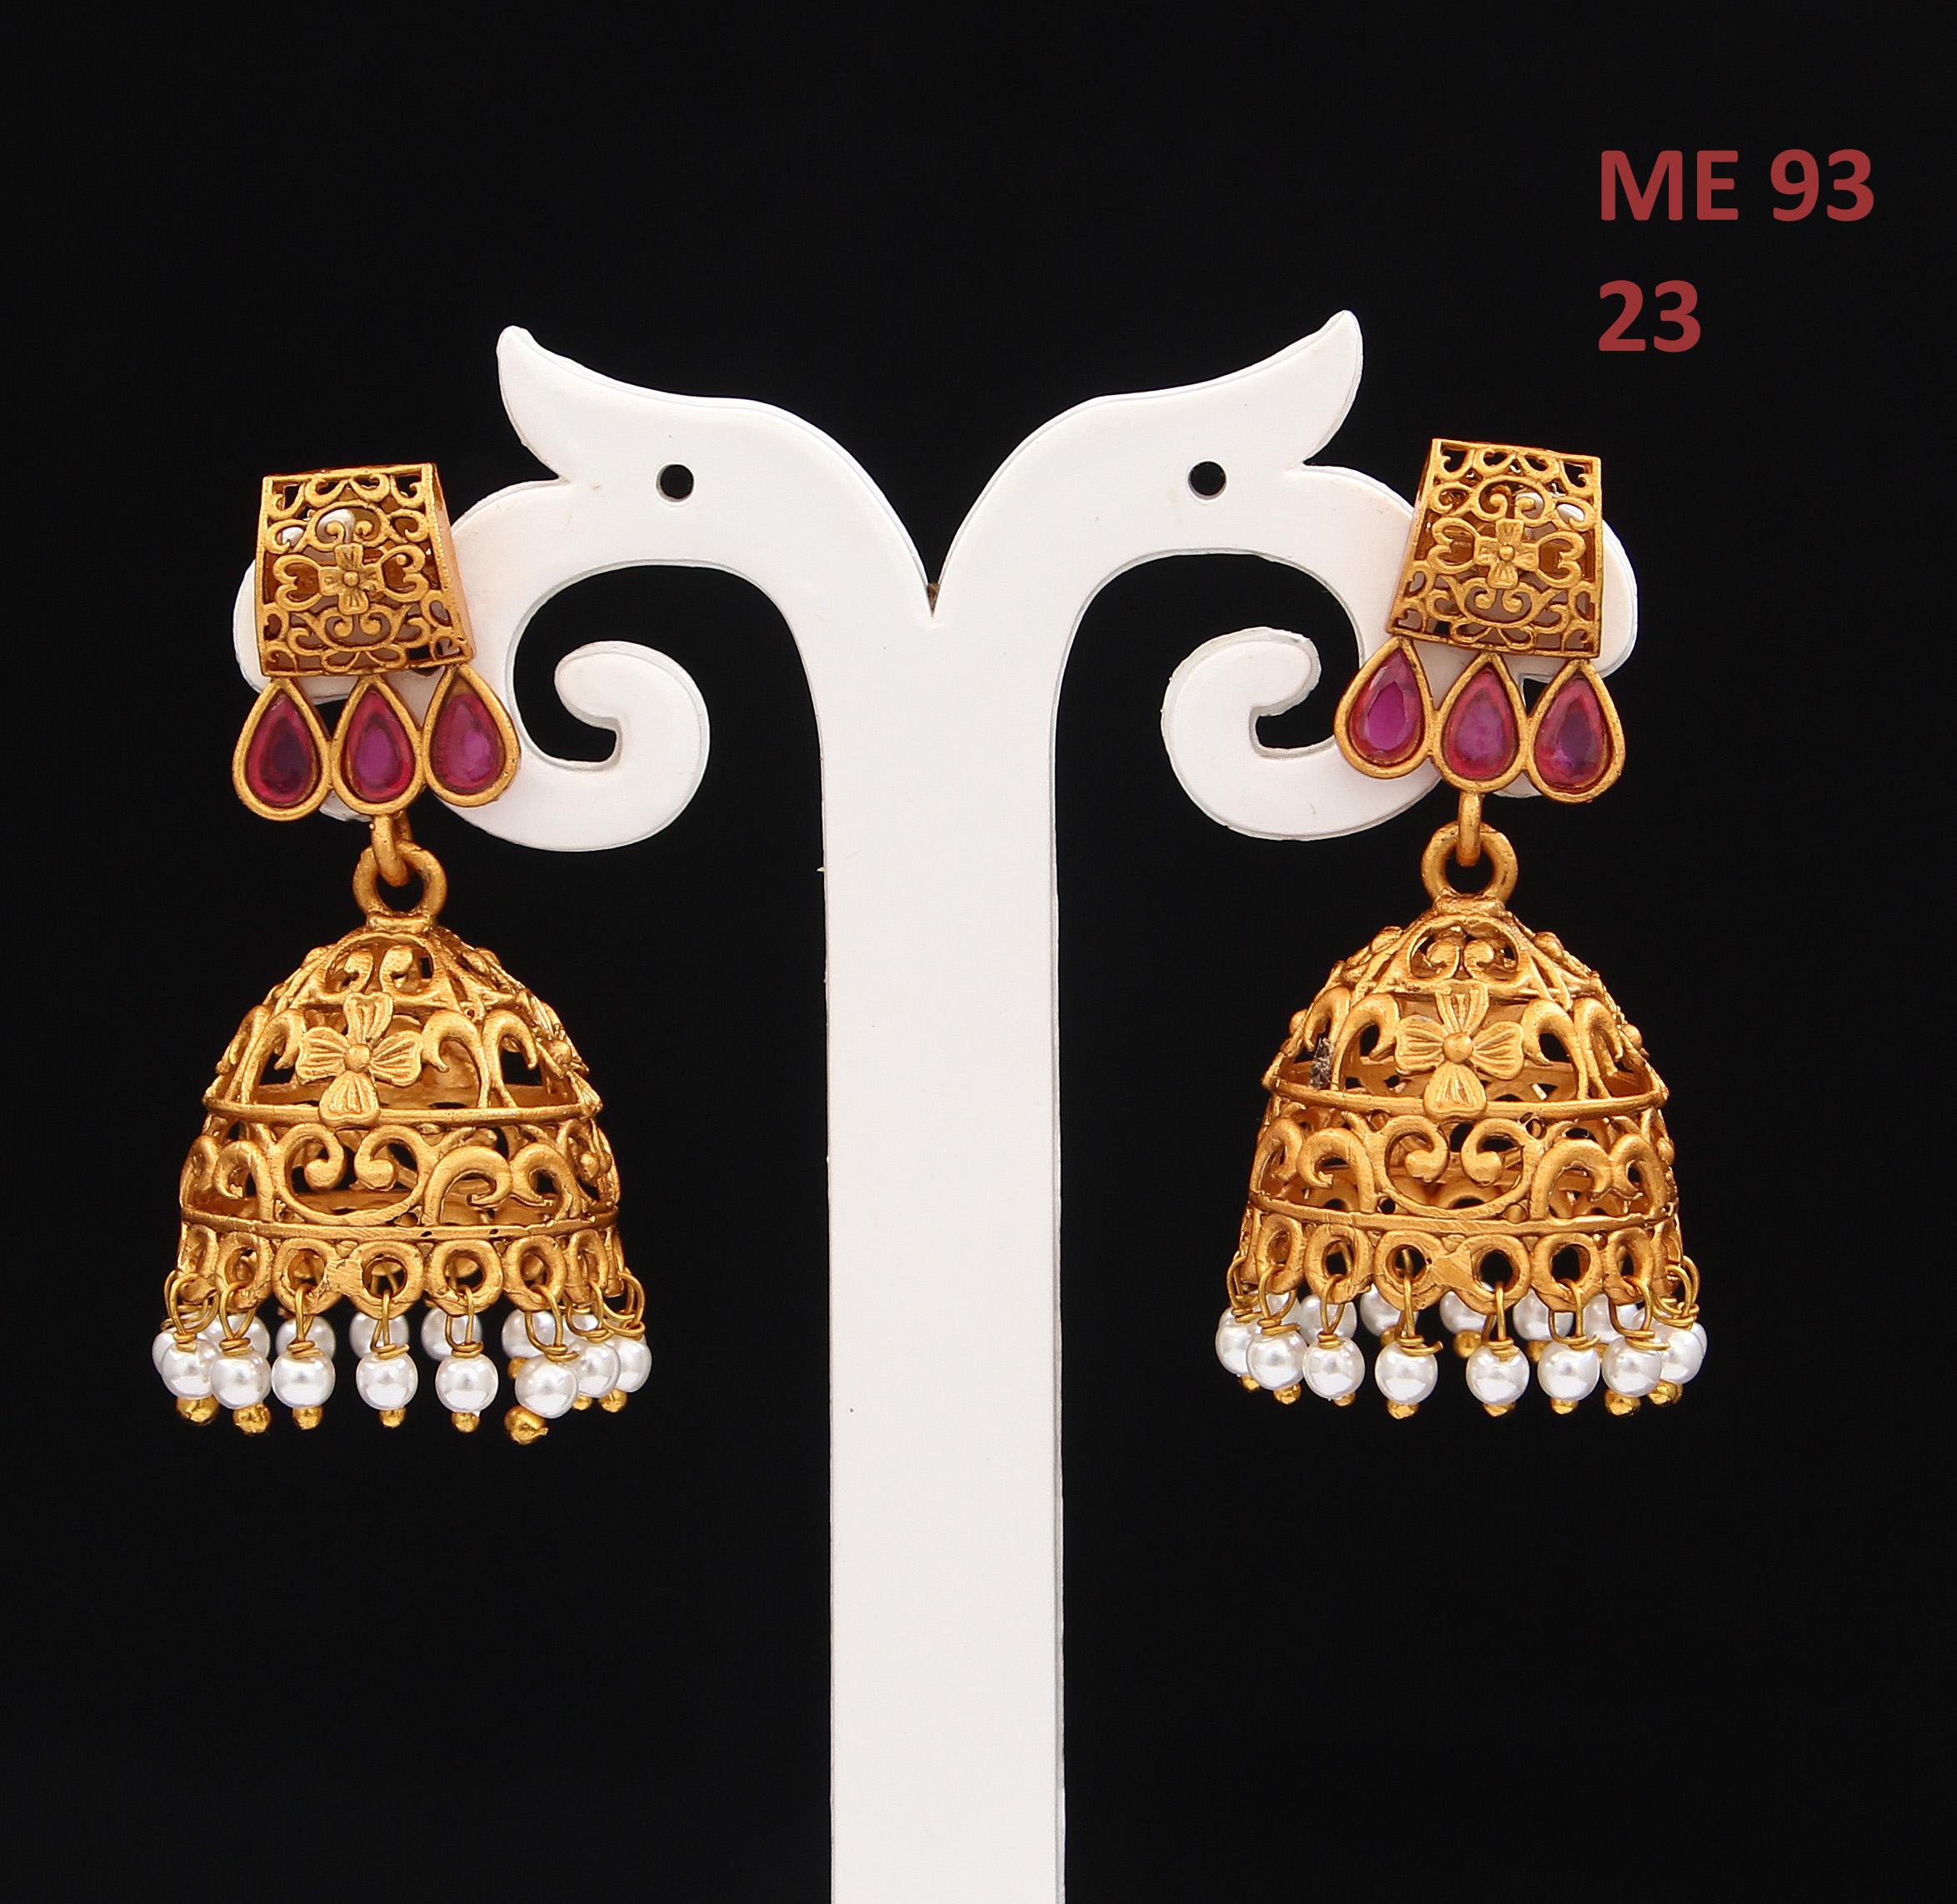 55Carat   Dangle & Drop Earrings 18K Gold Plated Blue Sapphire, Ruby, Kundan Blue Sapphire, Ruby Dangle & Drop Earrings 18K Gold Plated Blue Sapphire, Ruby, Kundan for Women Girls Ladies Exclusive Pretty